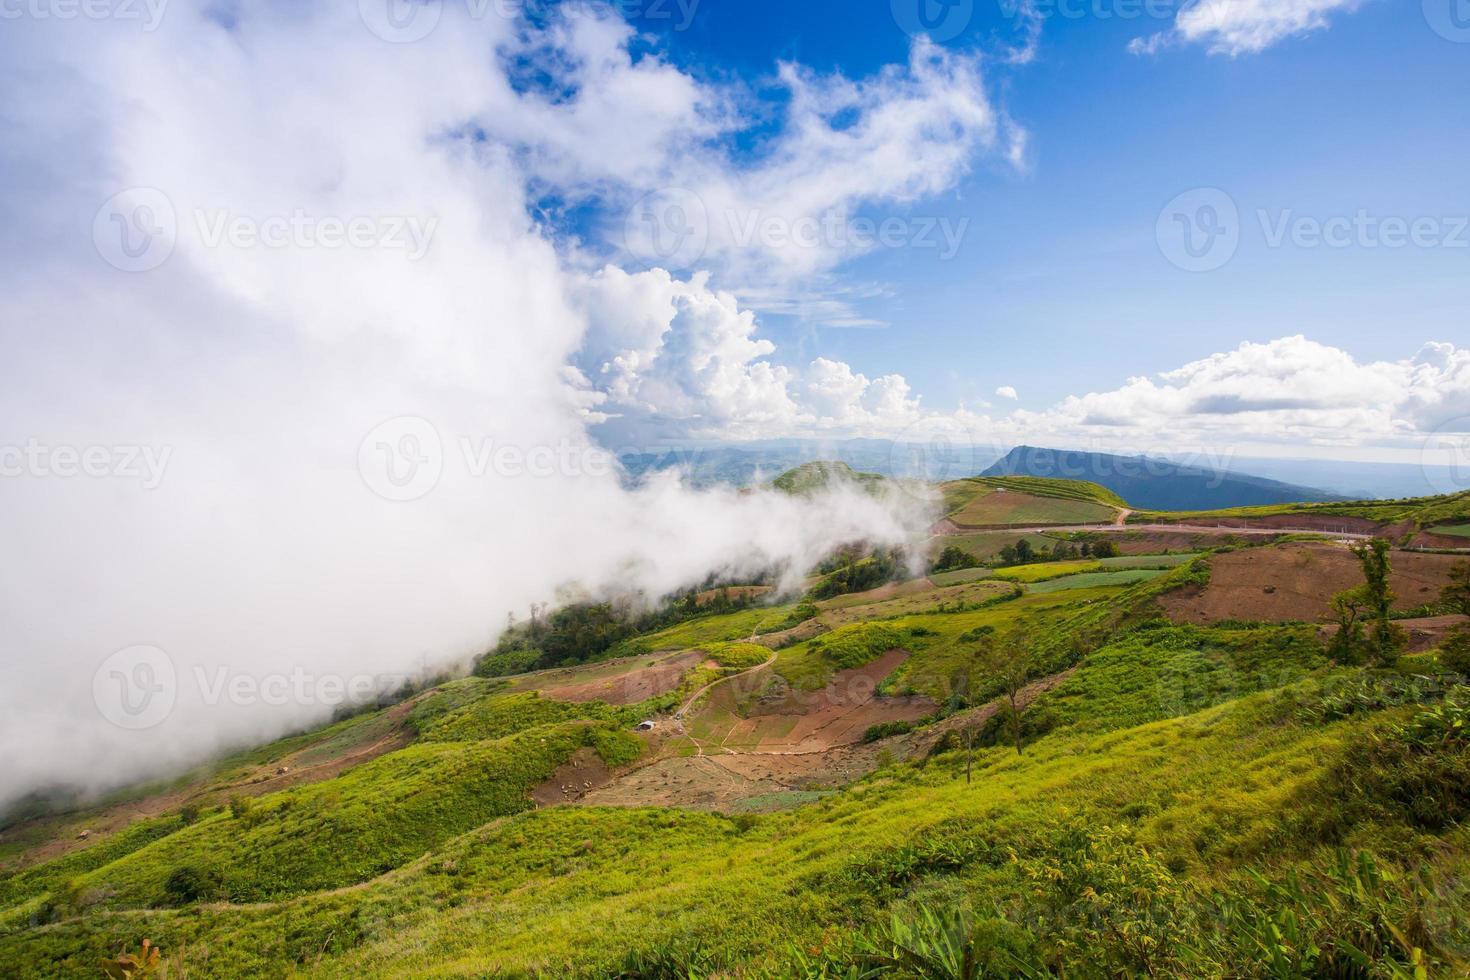 niebla cubriendo una colina foto